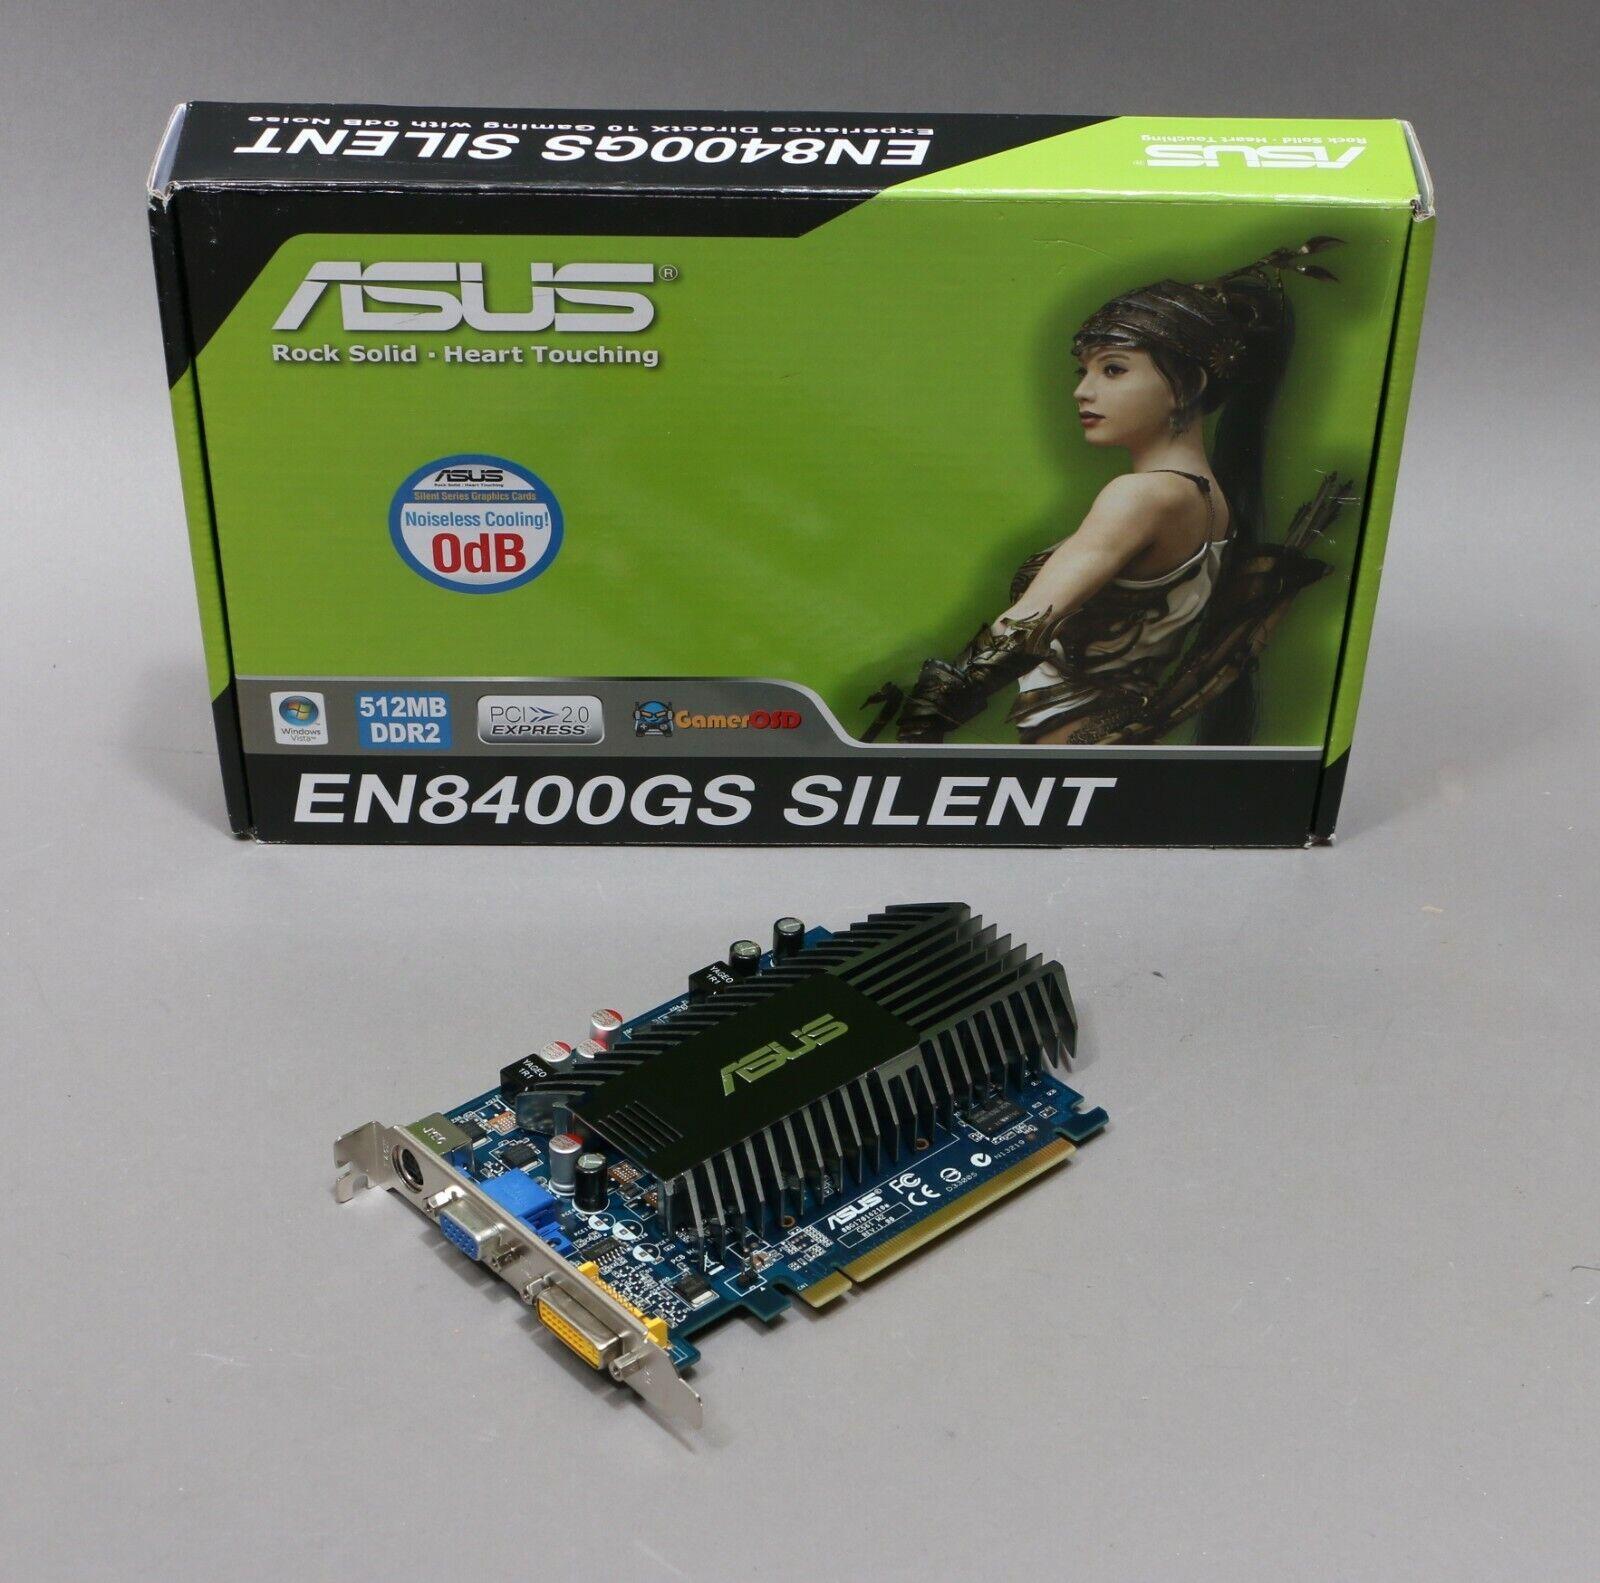 ASUS NVIDIA EN8400GS SILENT 512MB Windows 10 PCI-E 16x Video Card. DVI VGA Ports